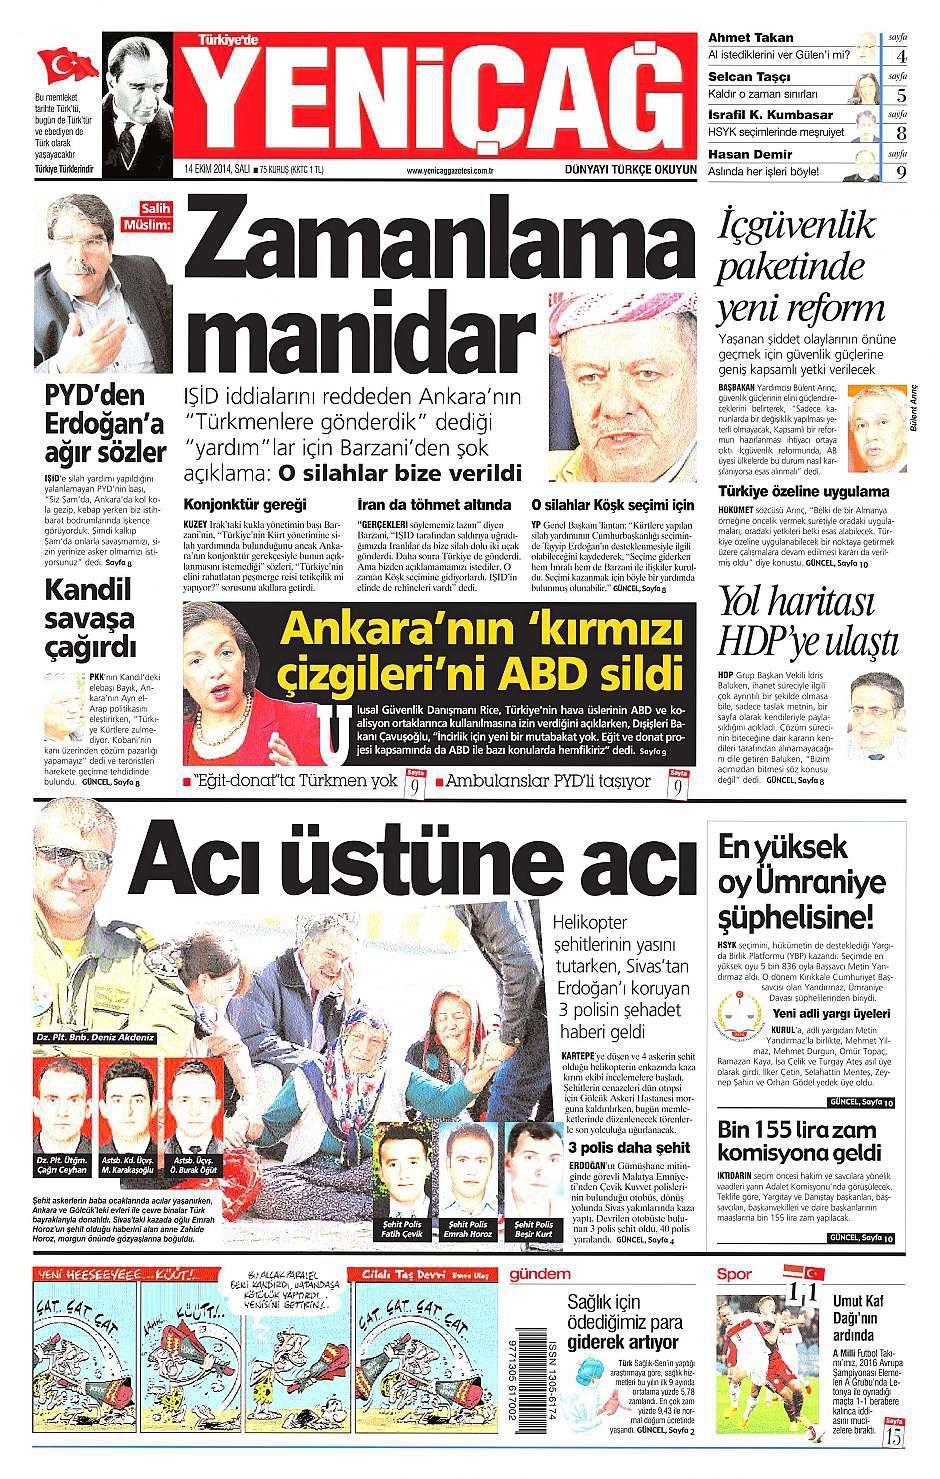 14 Ekim 2014 gazete manşetleri 17